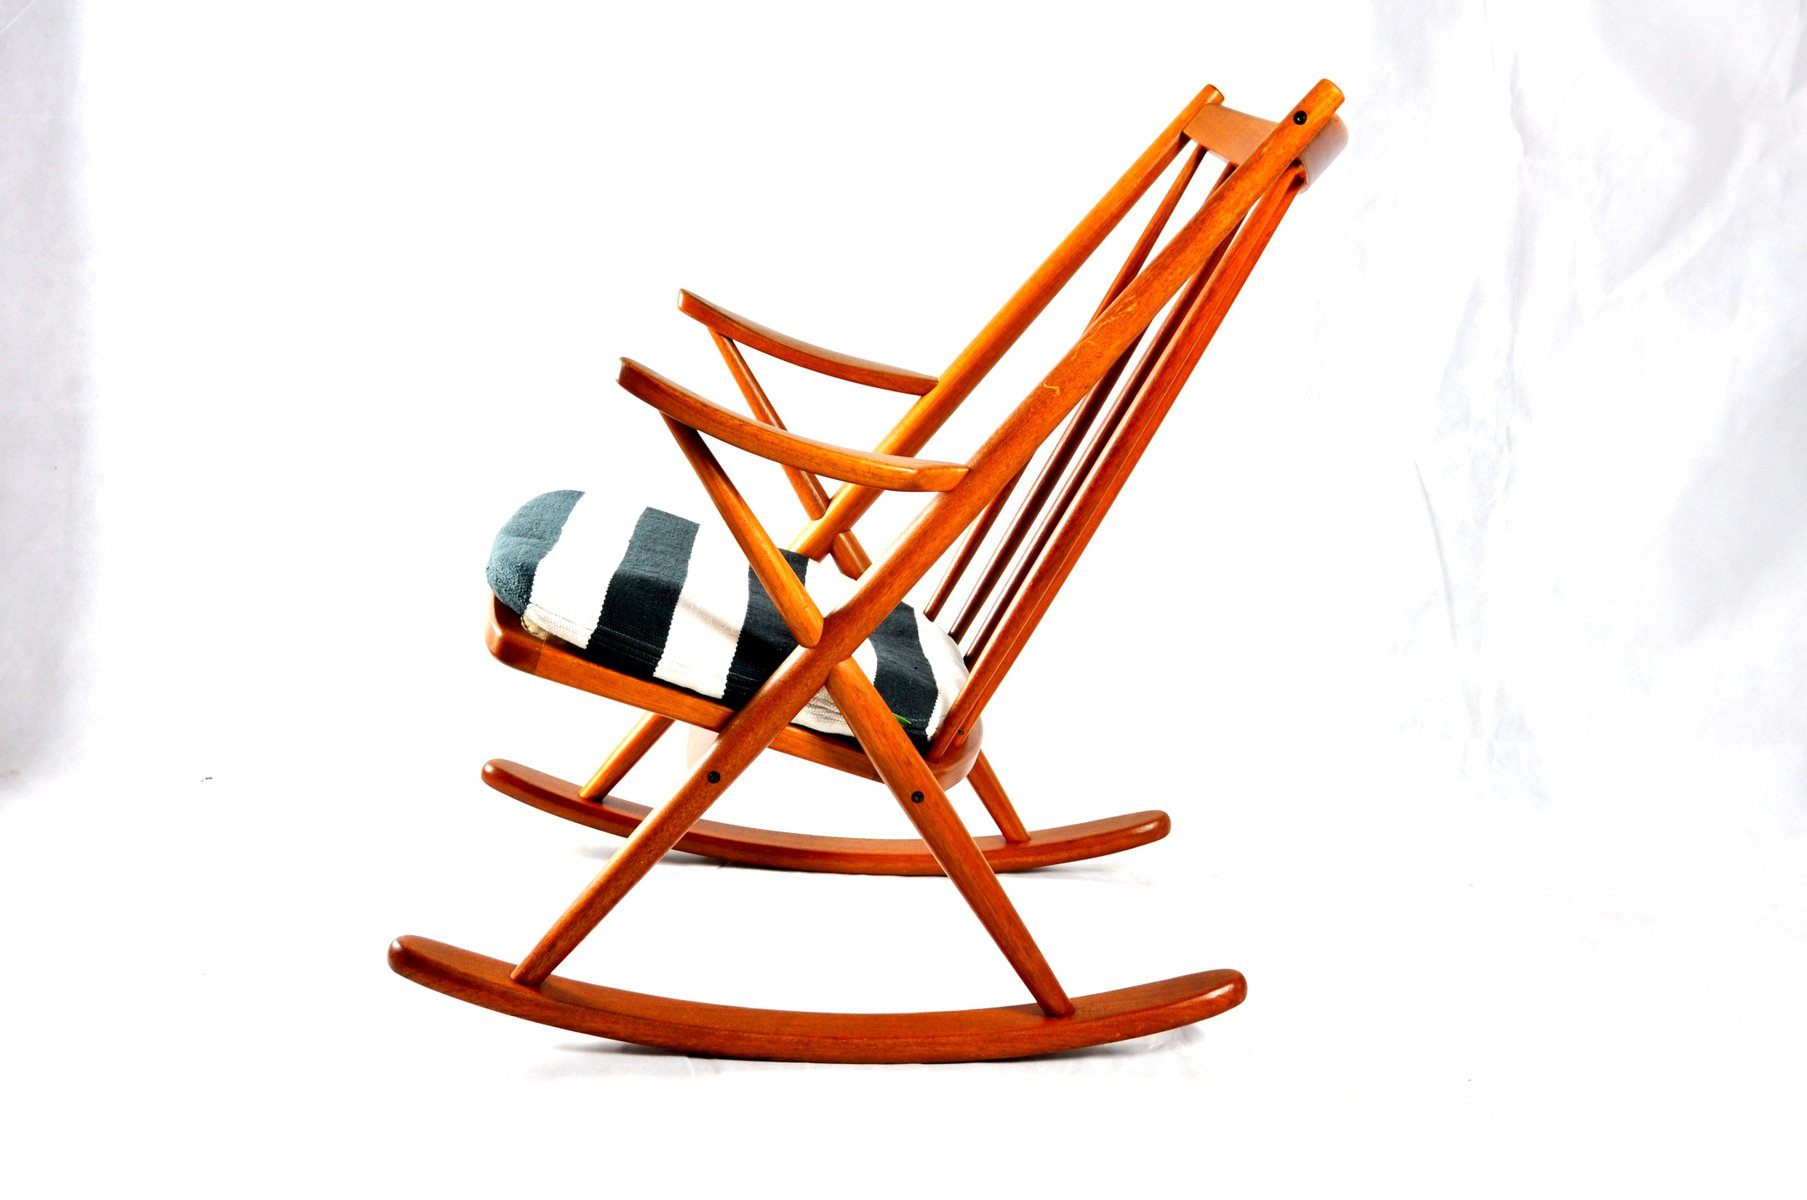 Frank reenskaug rocking chair - Rocking Chair 182 By Frank Reenskaug For Bramin 5 2 368 00 Price Per Piece